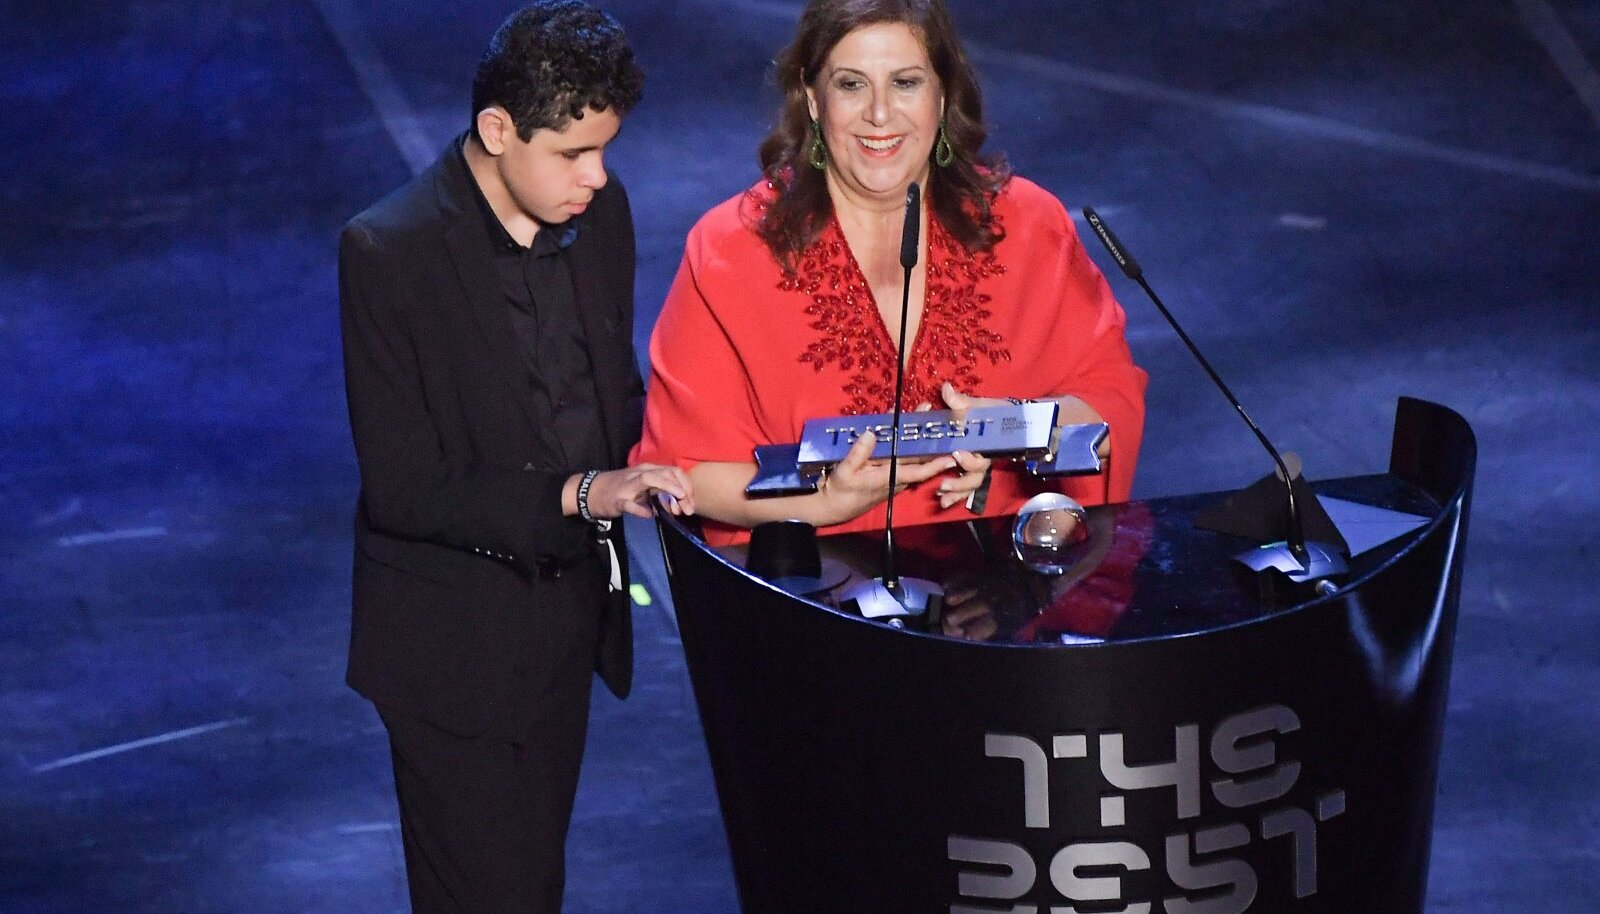 Николас и Сильвия на вручении награды FIFA The Best